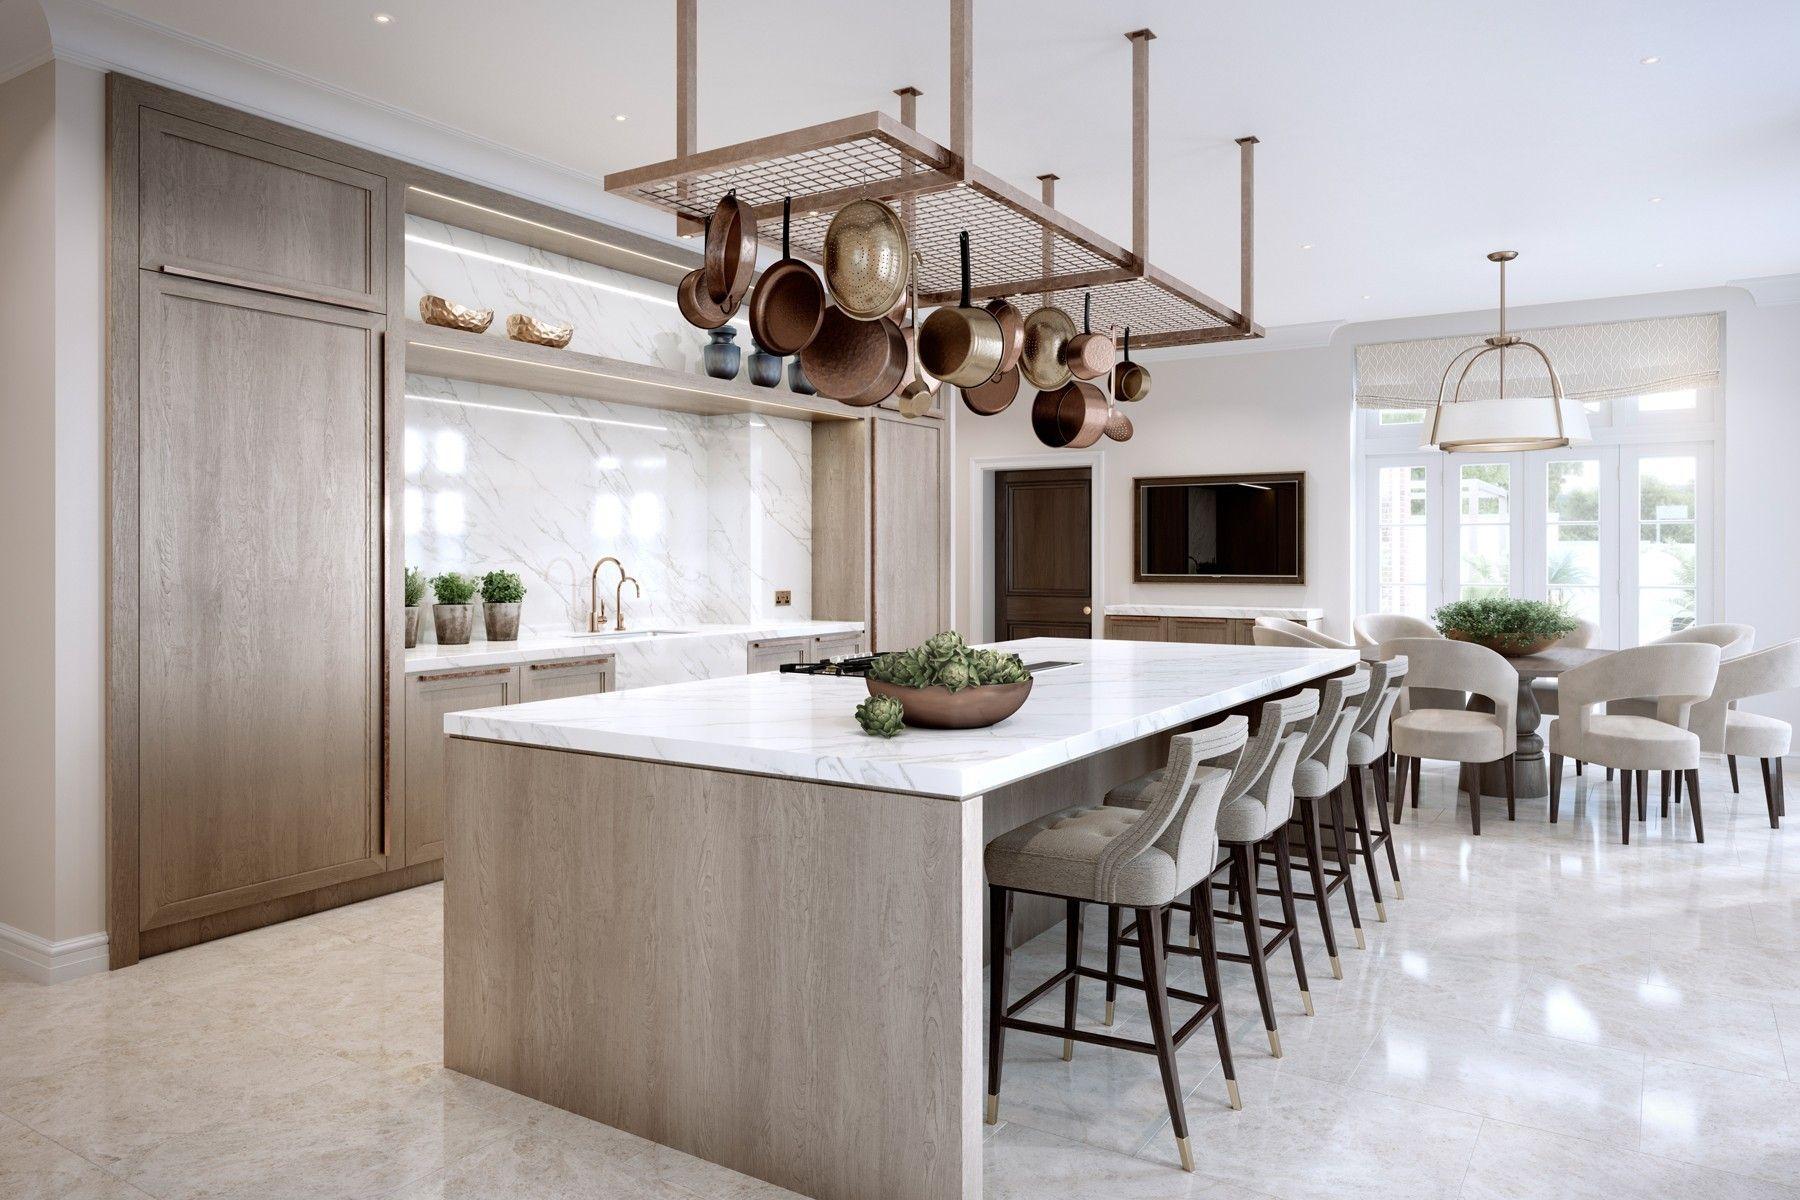 kitchen seating ideas surrey family home luxury interior design laura hammett my new on kitchen interior luxury id=57232